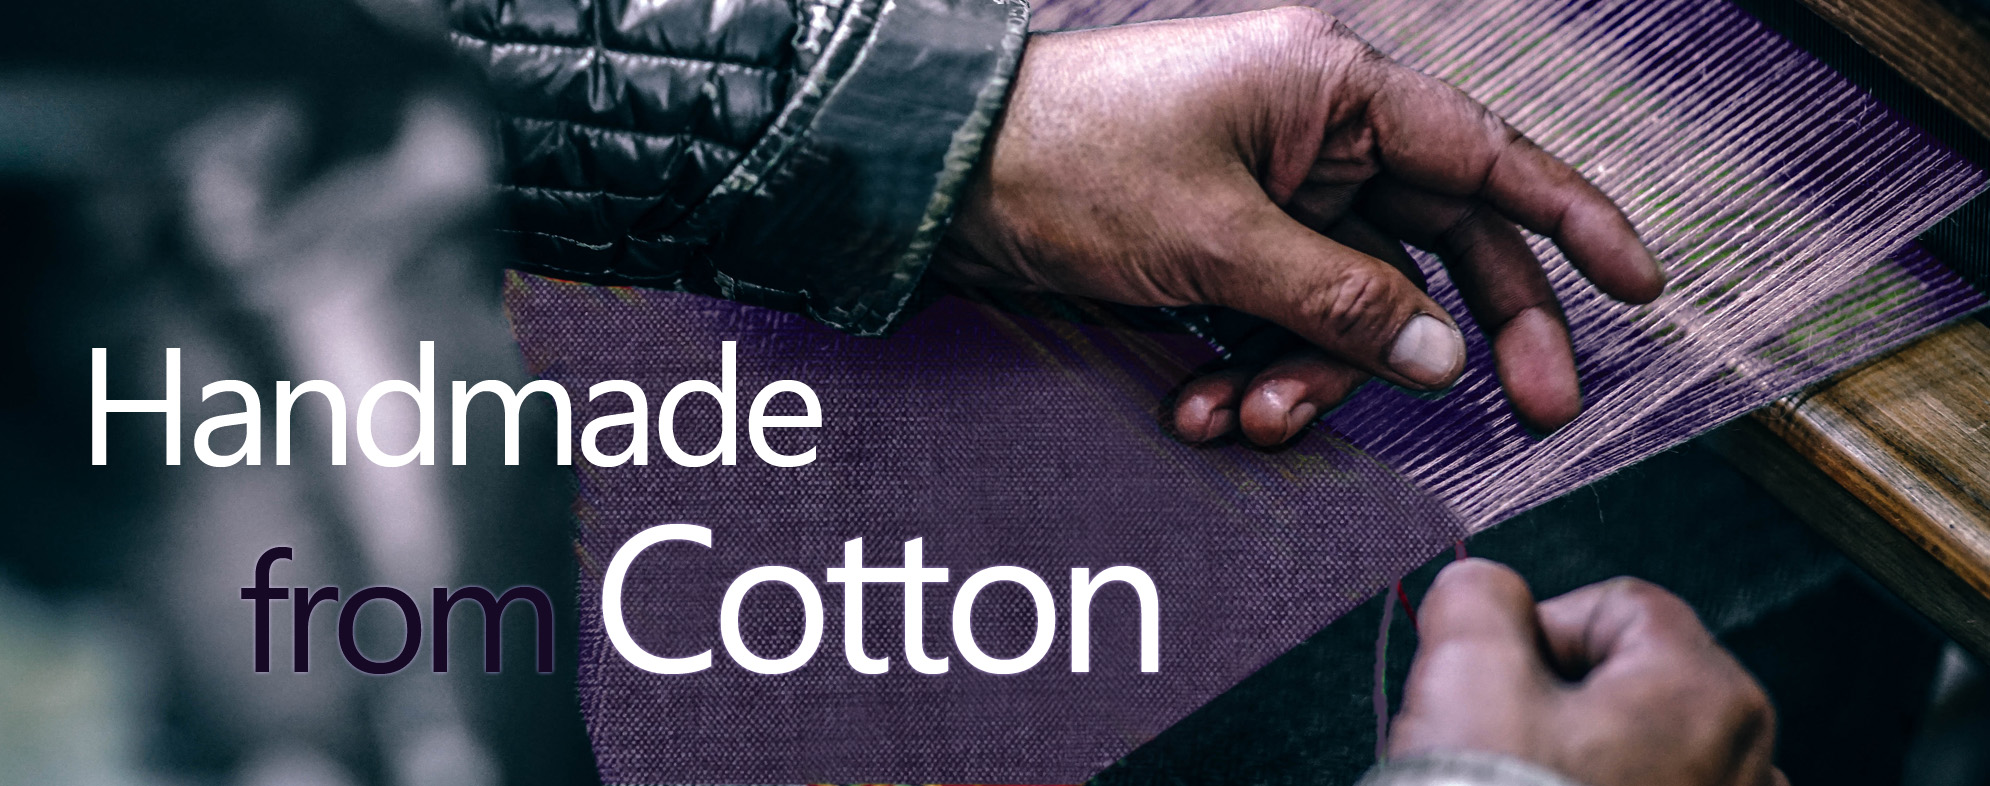 Handemade Cotton yoga mat